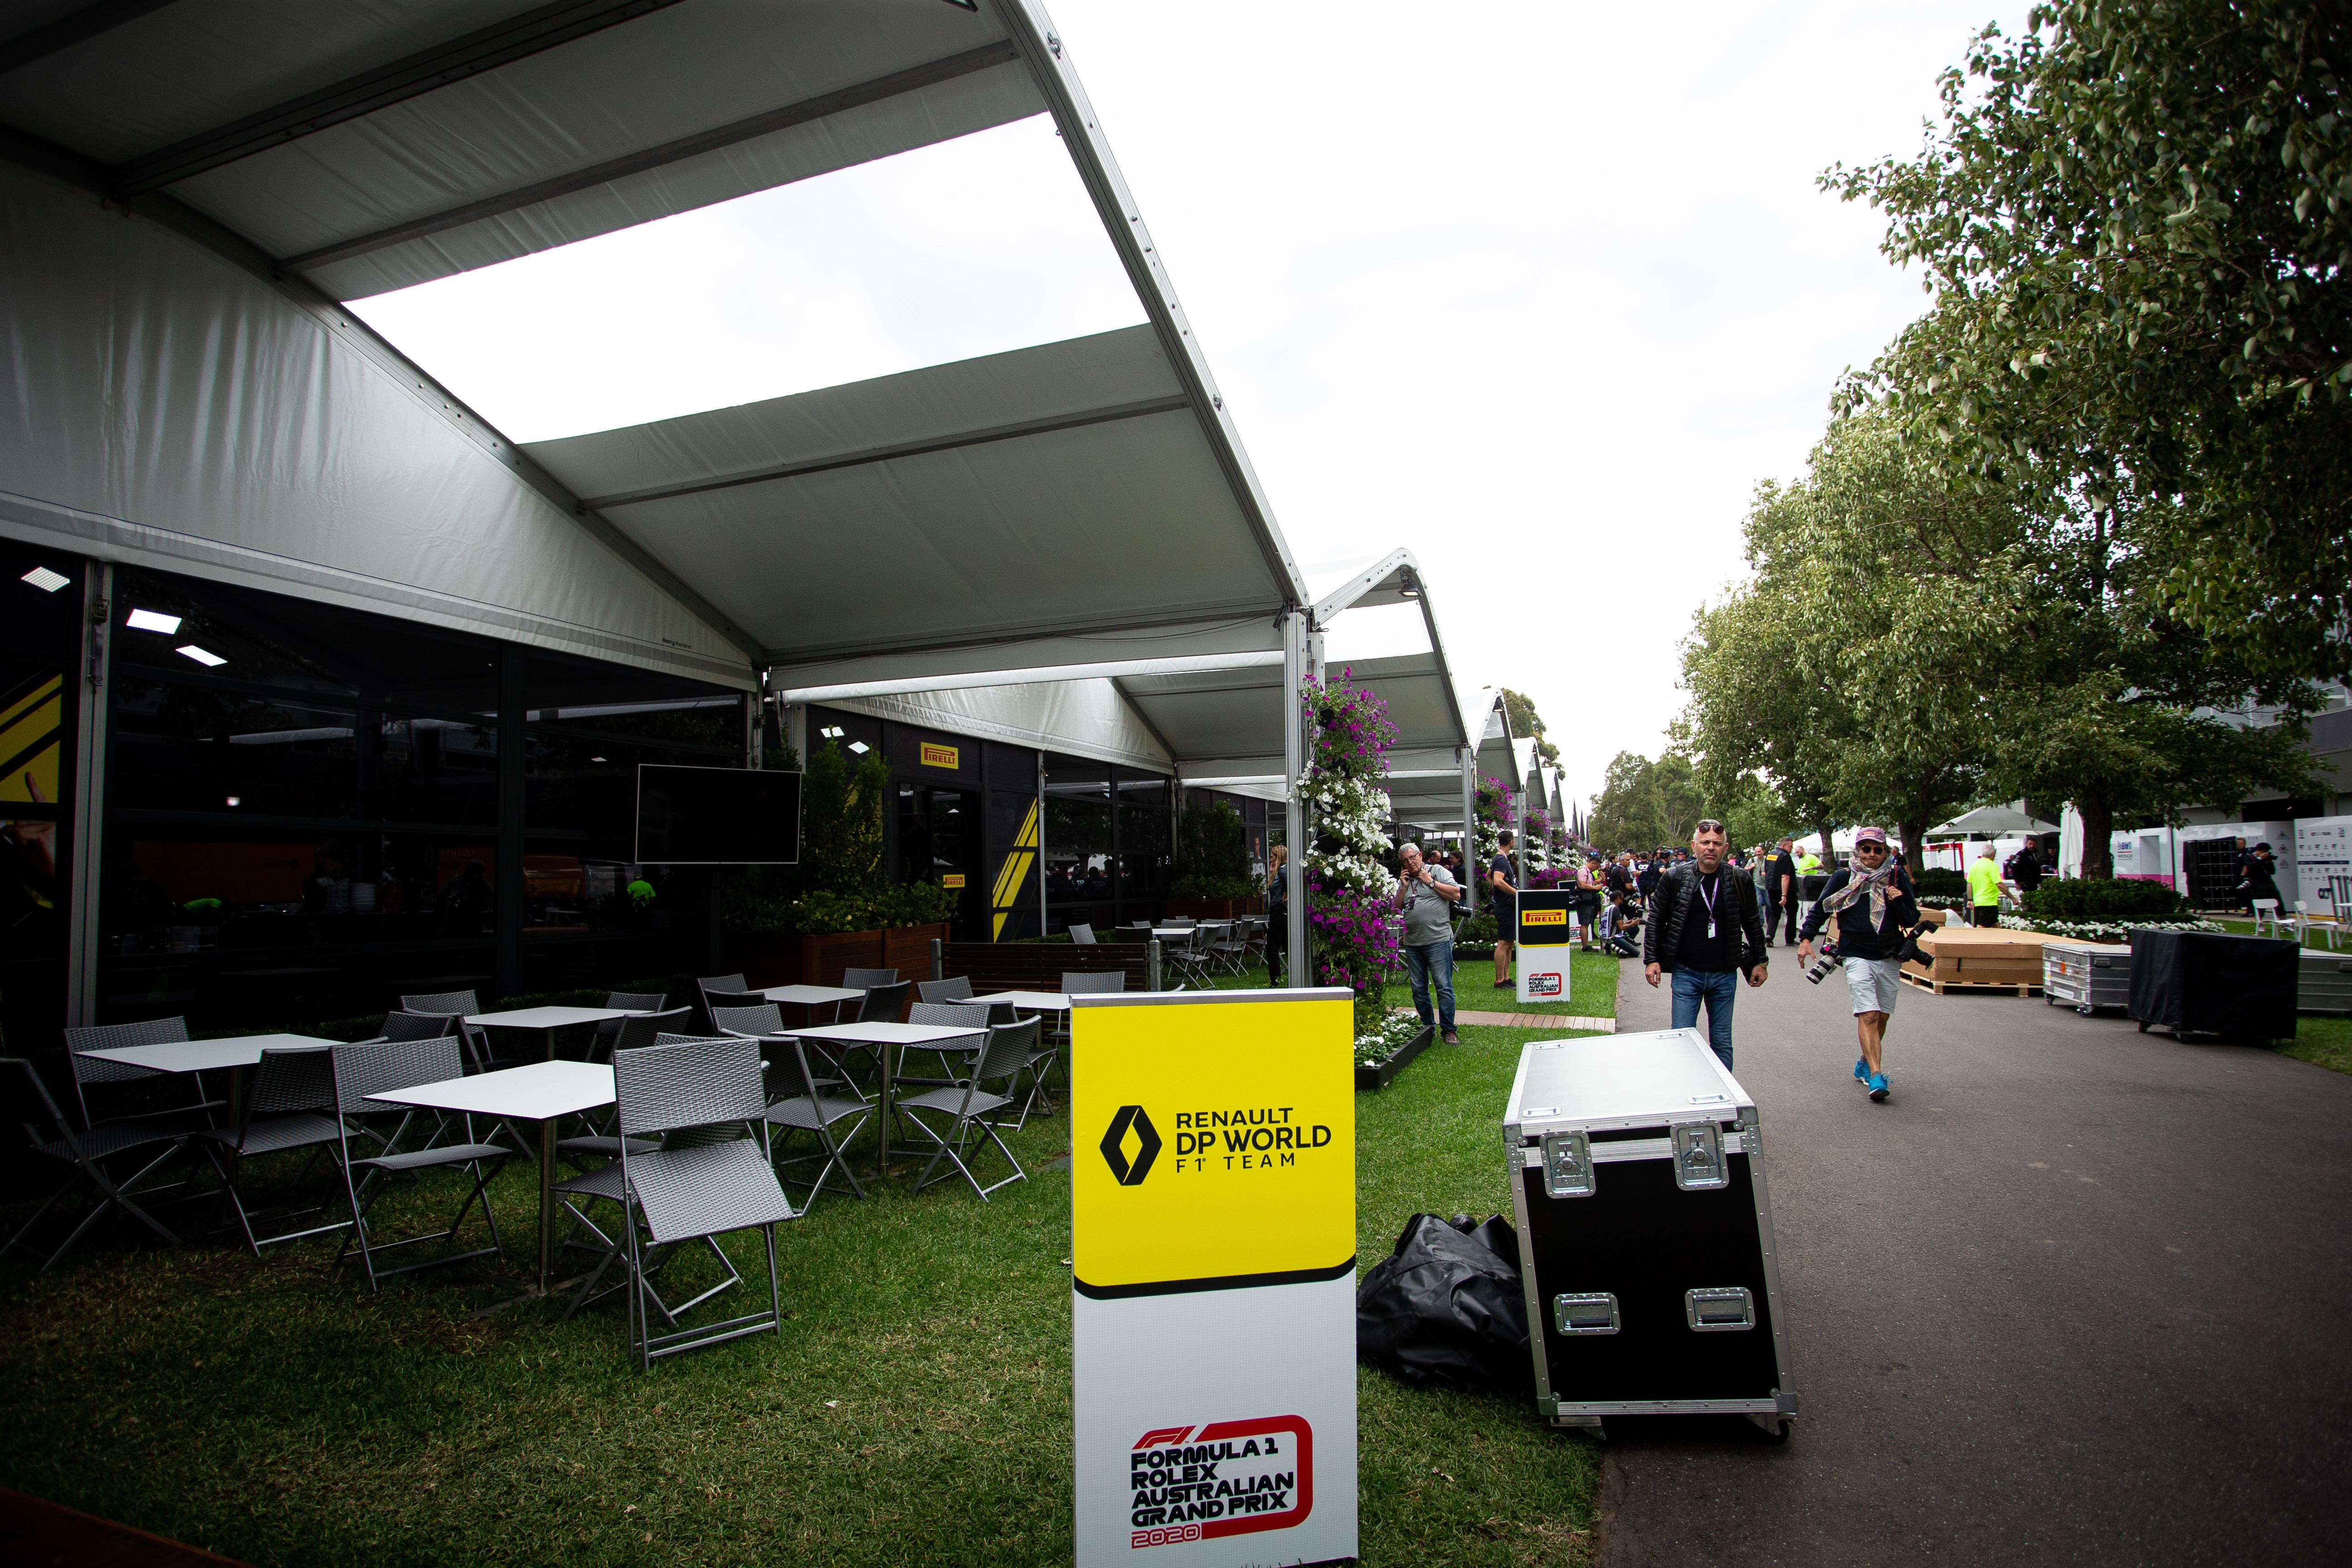 Renault paddock area Australian Grand Prix 2020